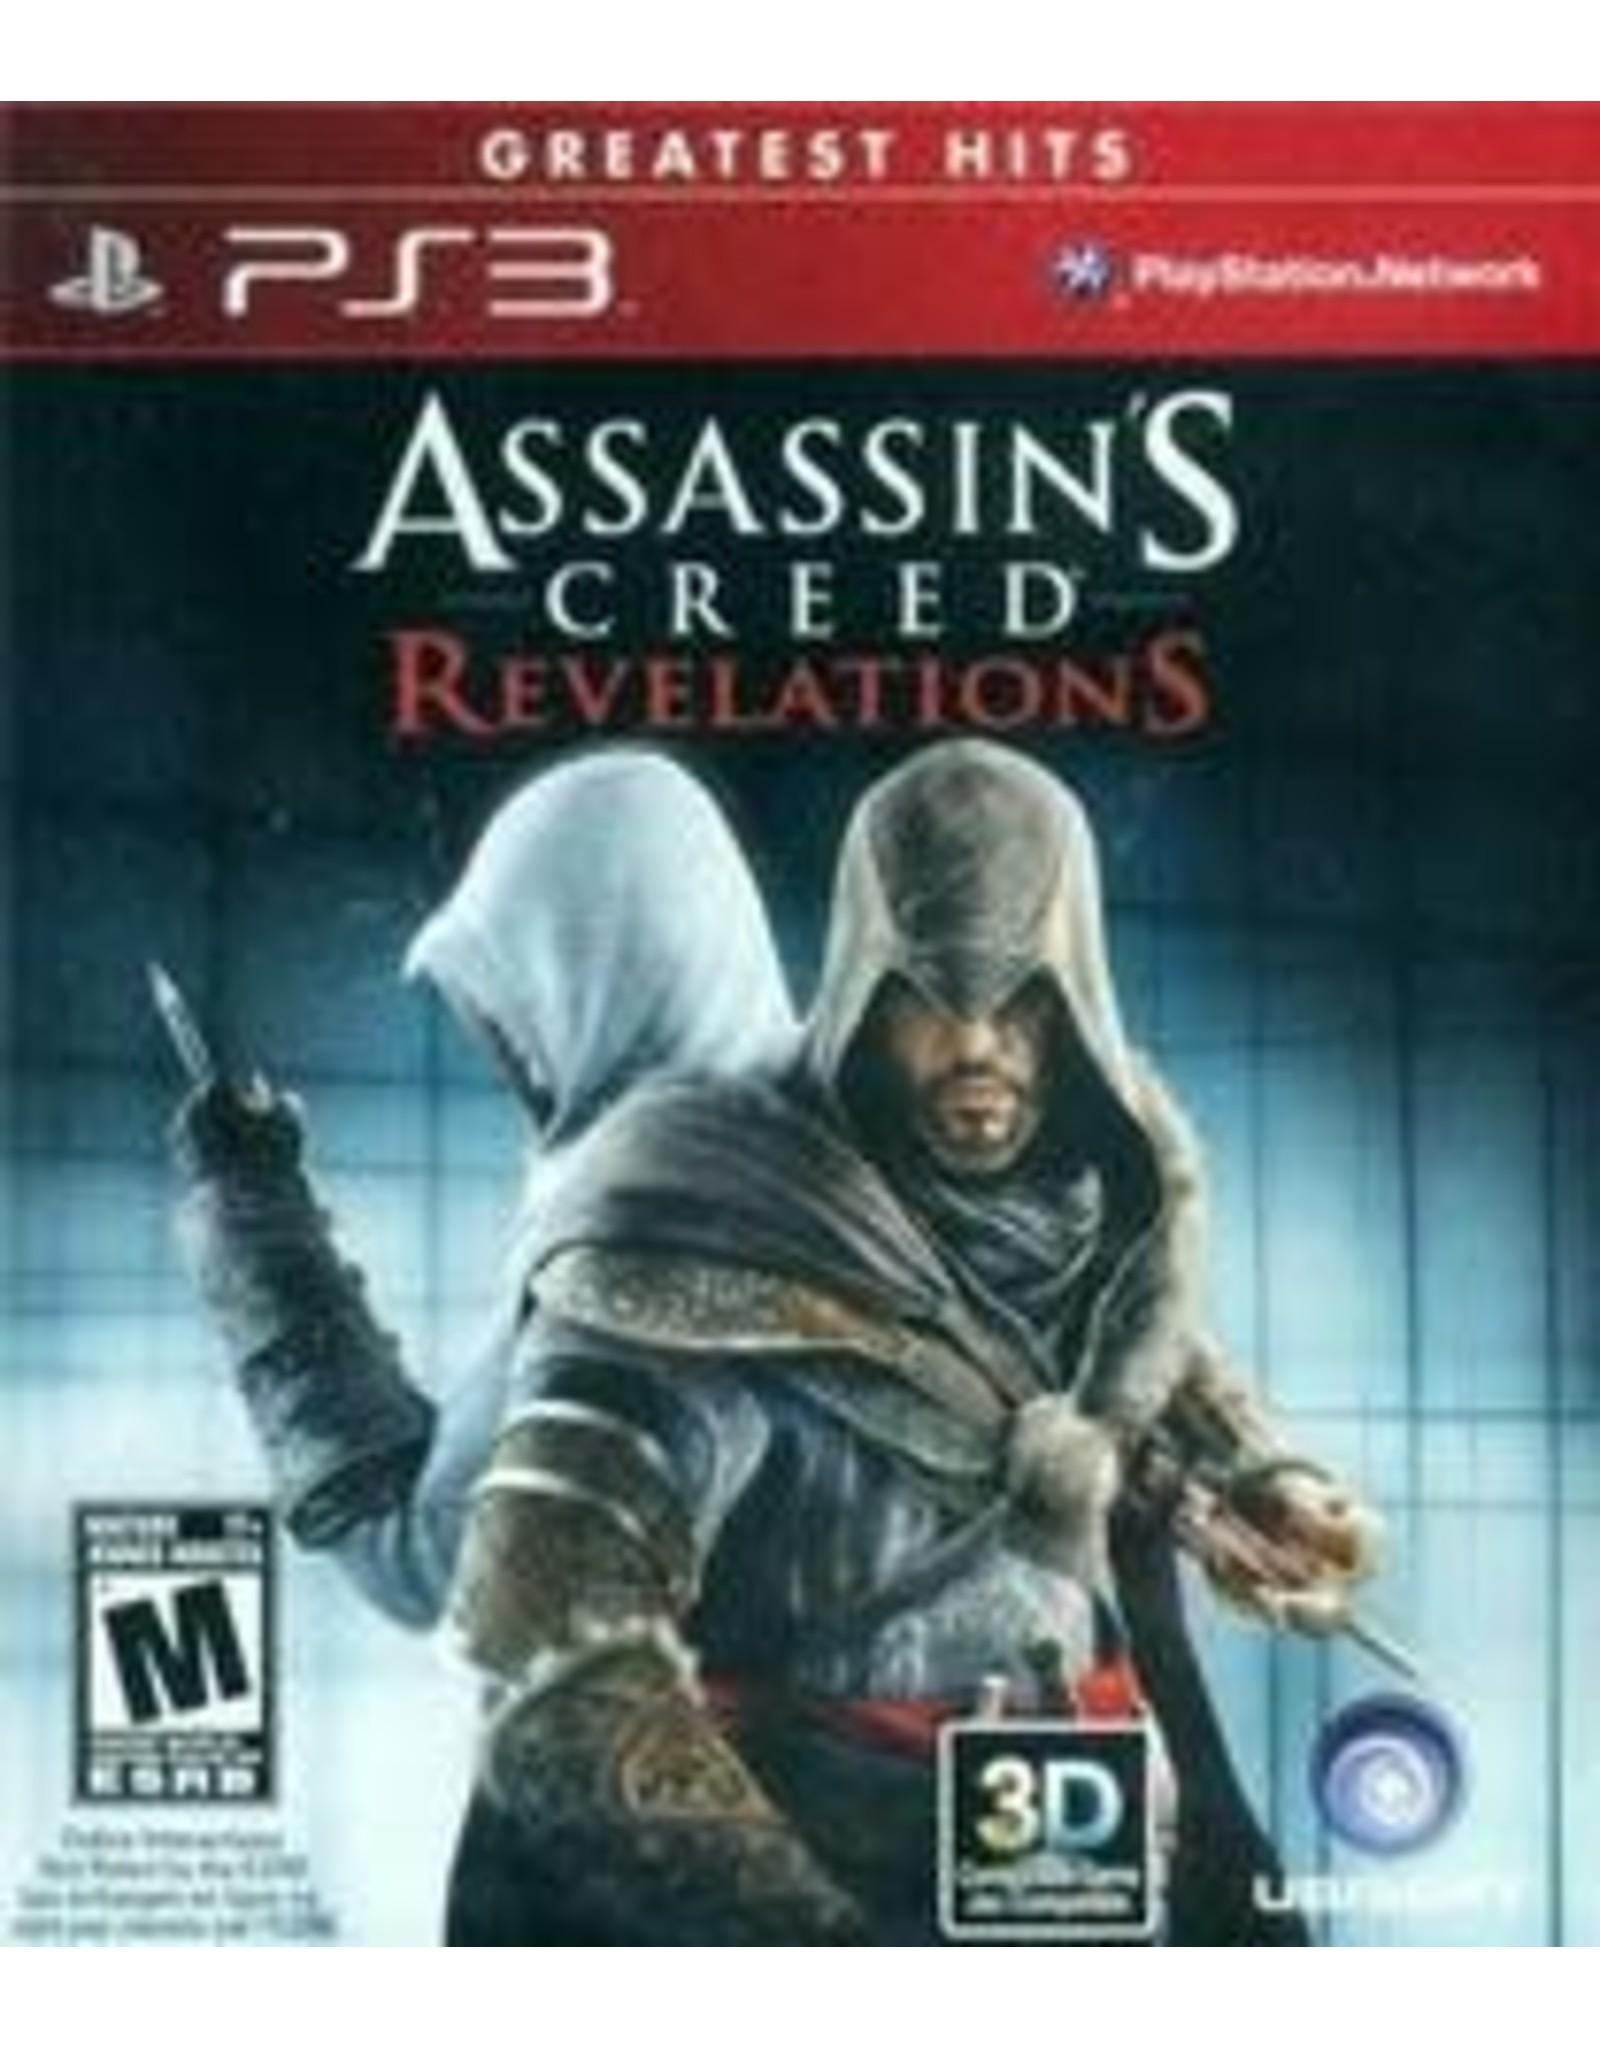 Playstation 3 Assassin's Creed Revelations (Greatest Hits, CiB)